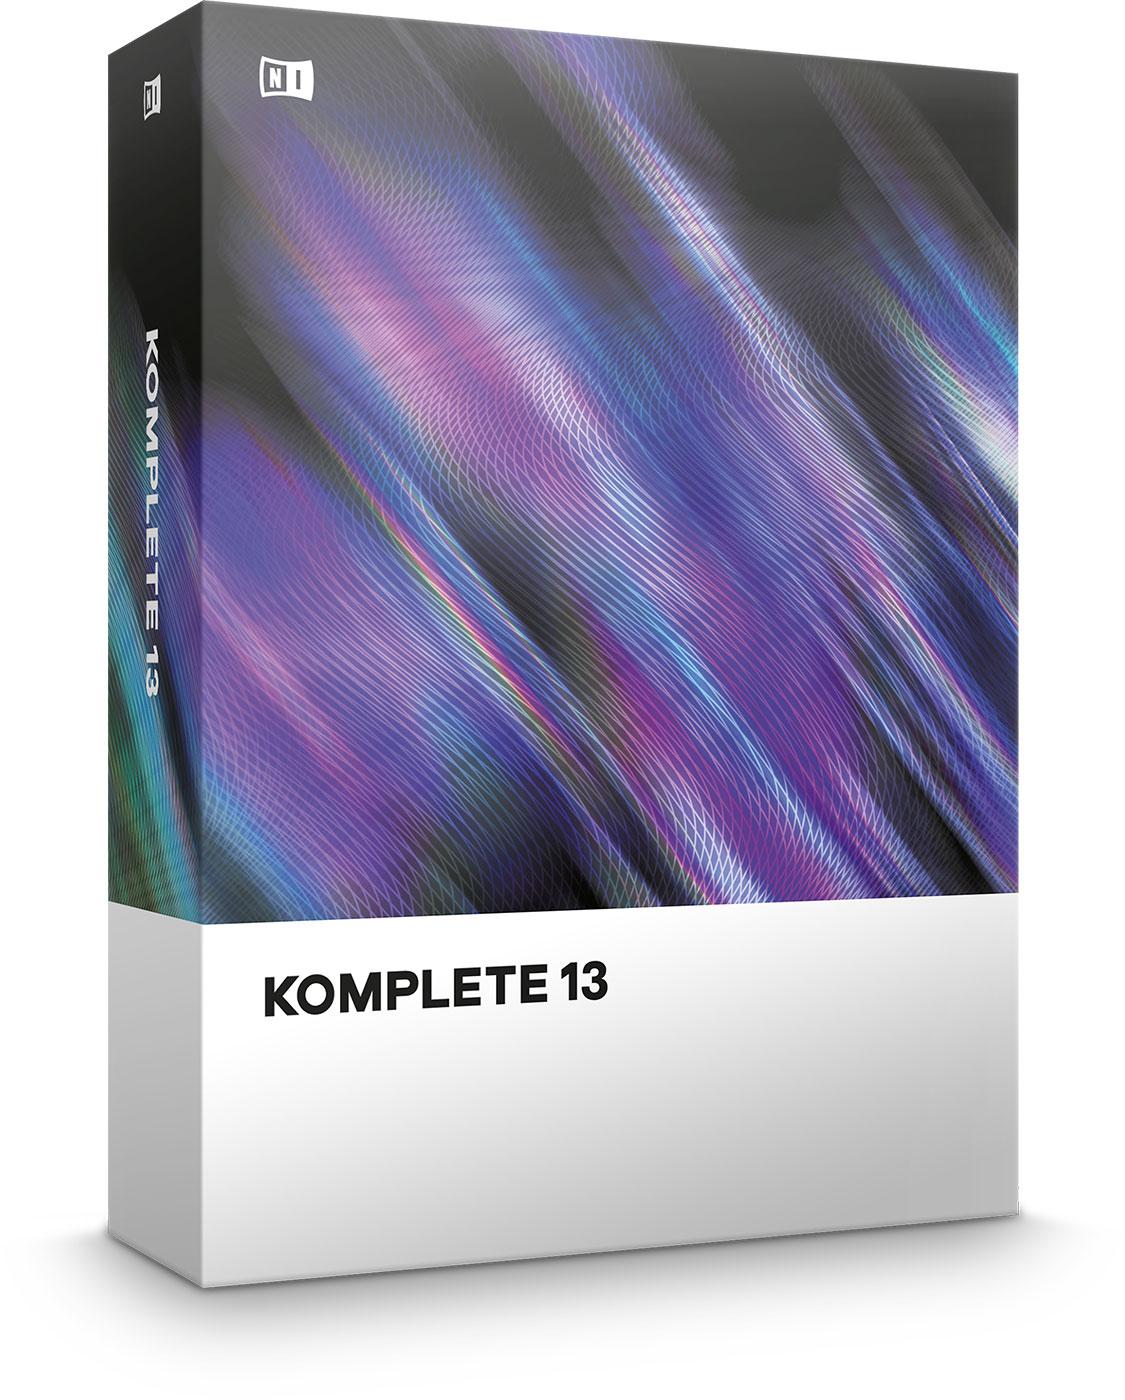 Komplete-13-packshot